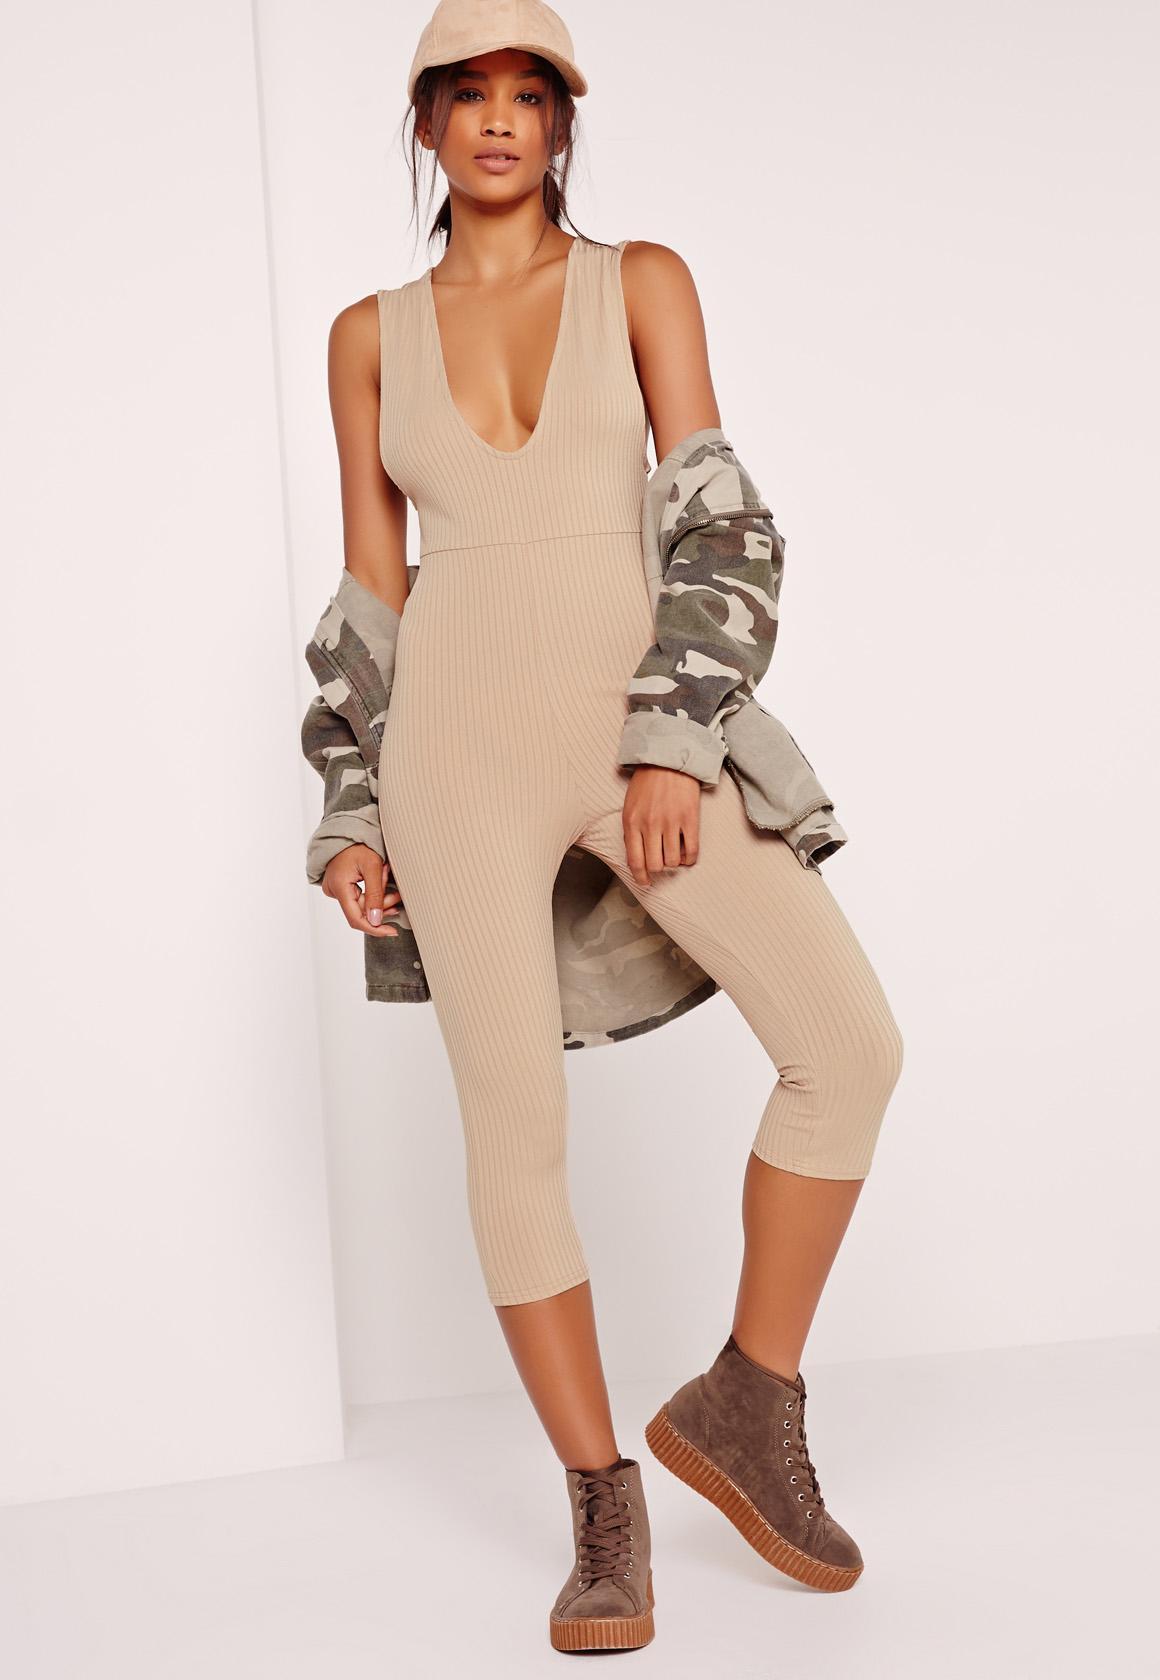 91473e0a5b9 Lyst - Missguided Ribbed Sleeveless 3 4 Leg Unitard Jumpsuit Camel